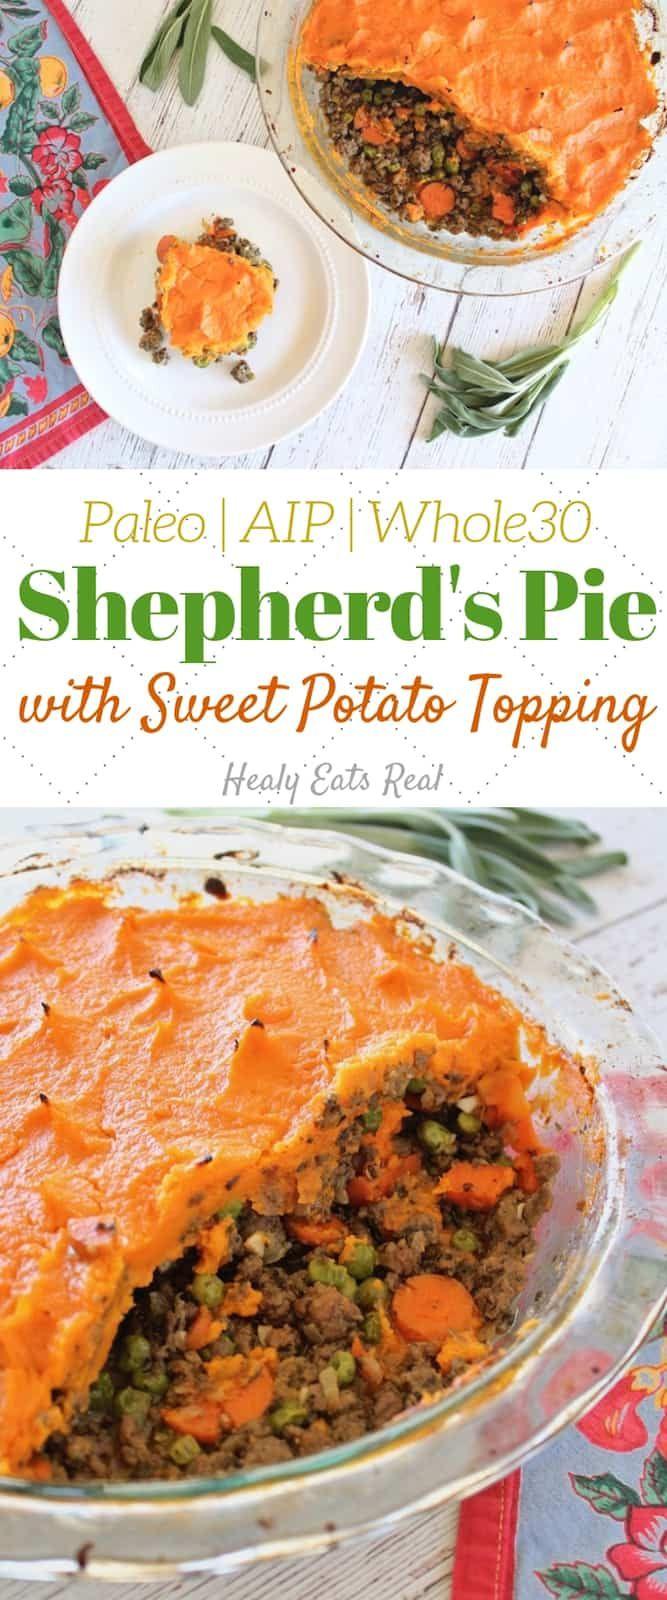 Shepherd's Pie Recipe with Sweet Potato (Paleo, AIP, Whole30)